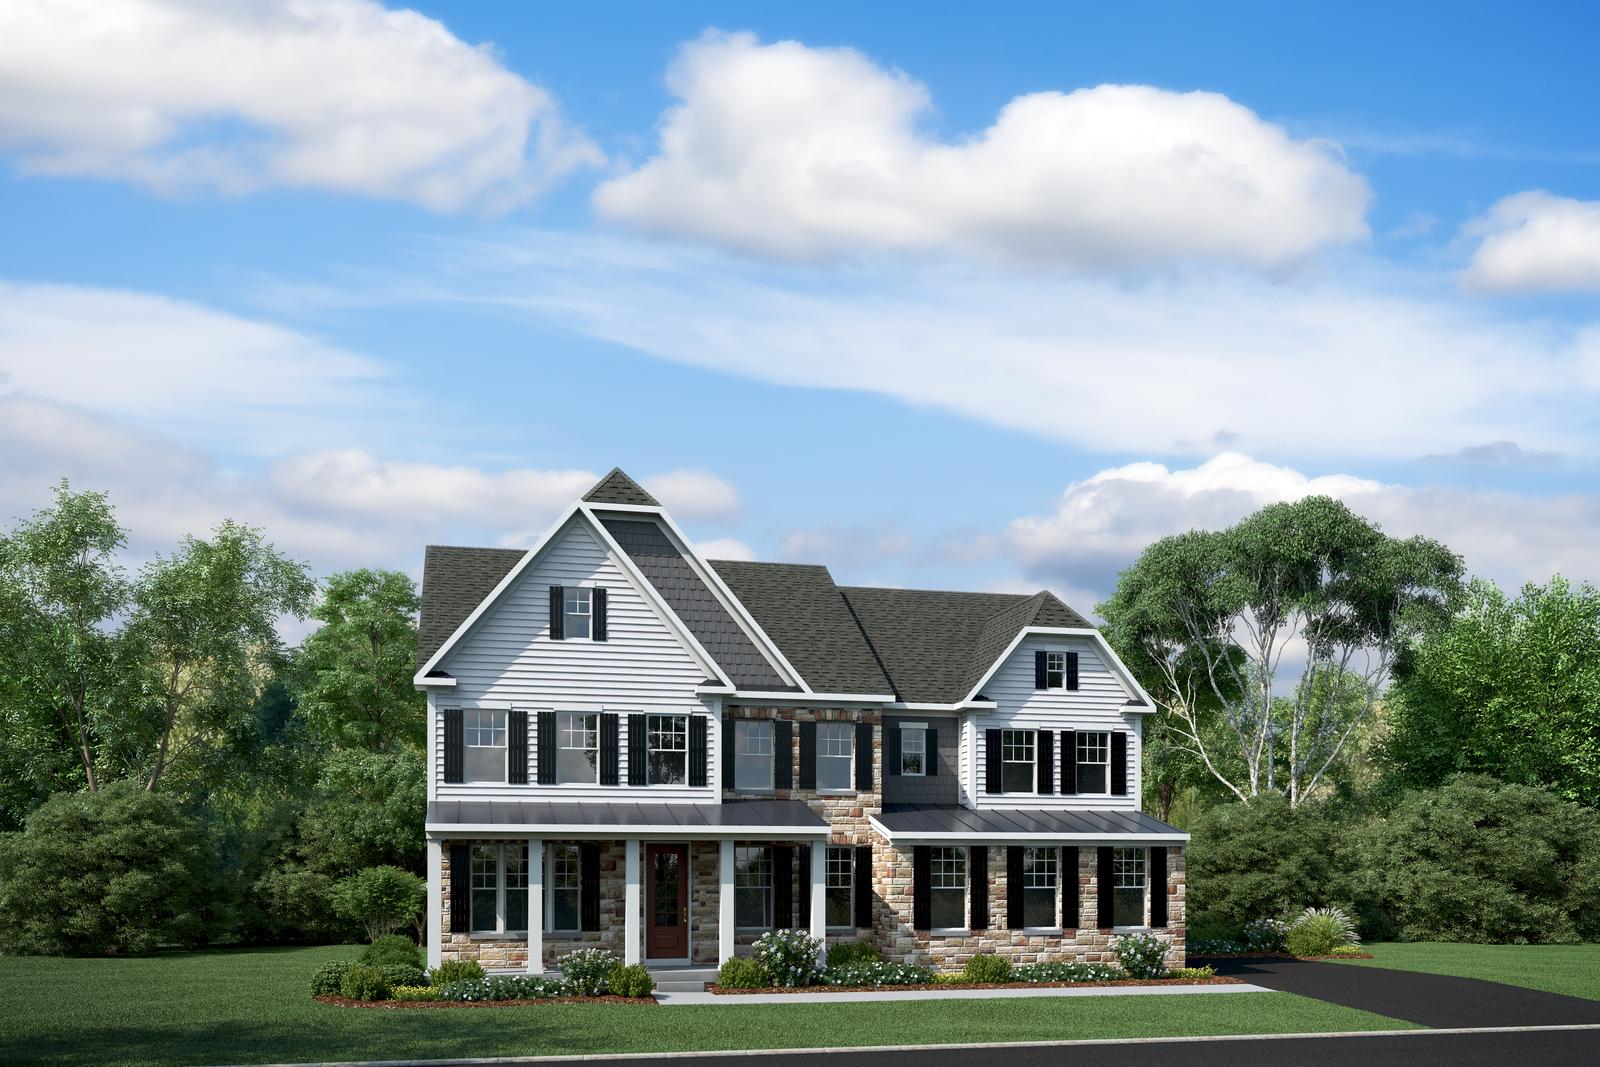 New Marymount Home Model For Sale Heartland Homes